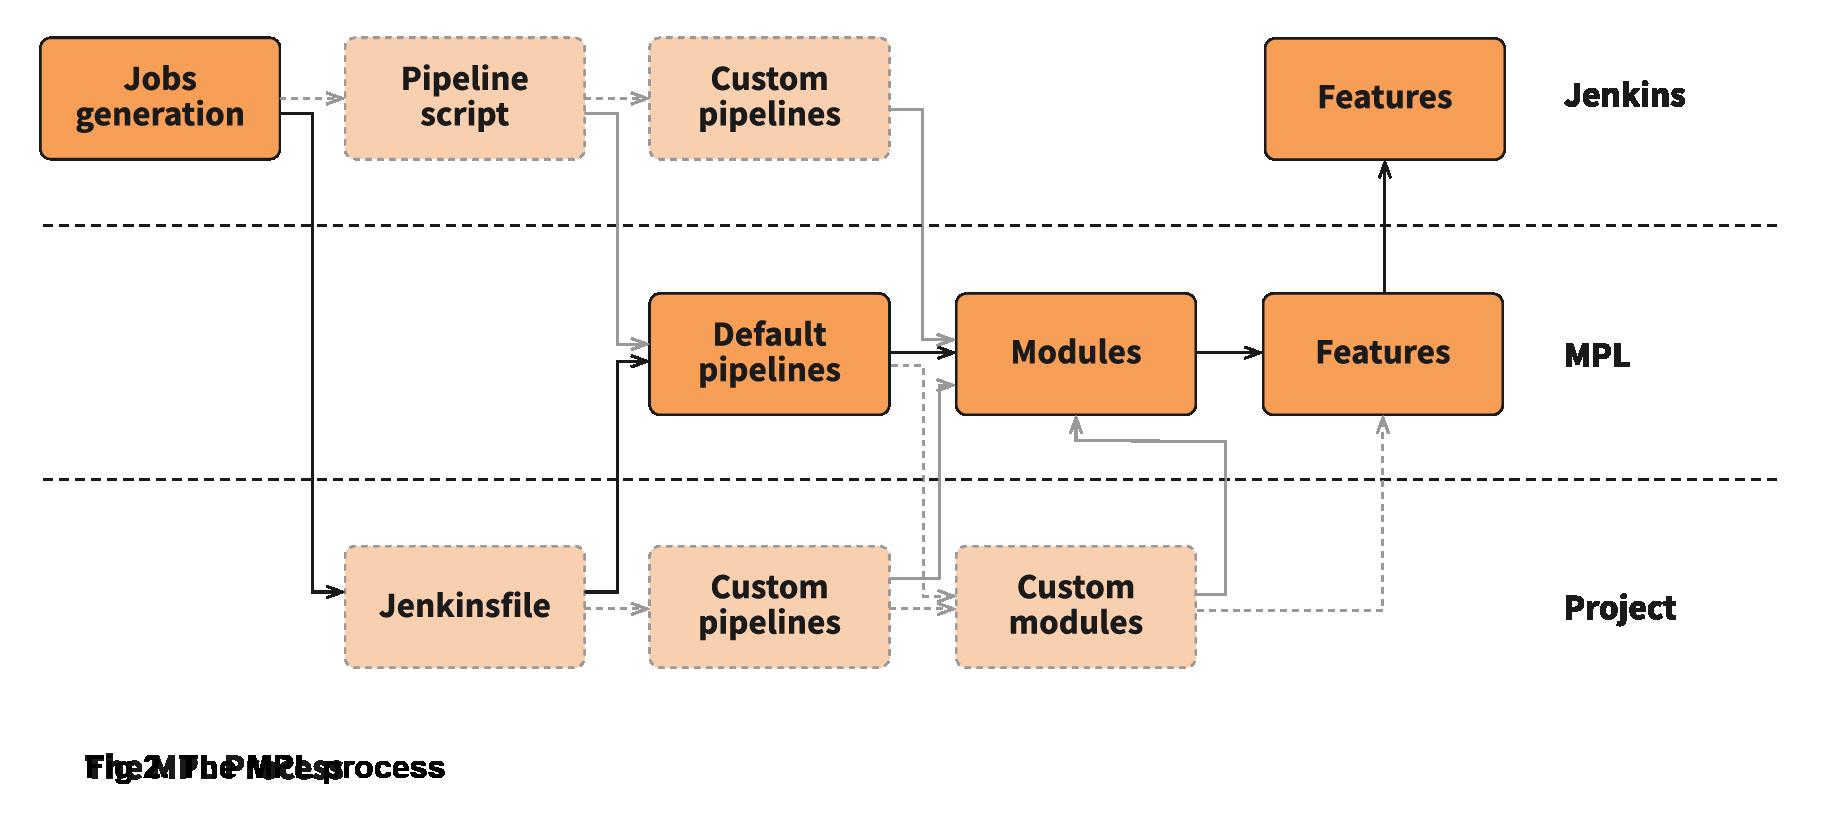 The MPL process